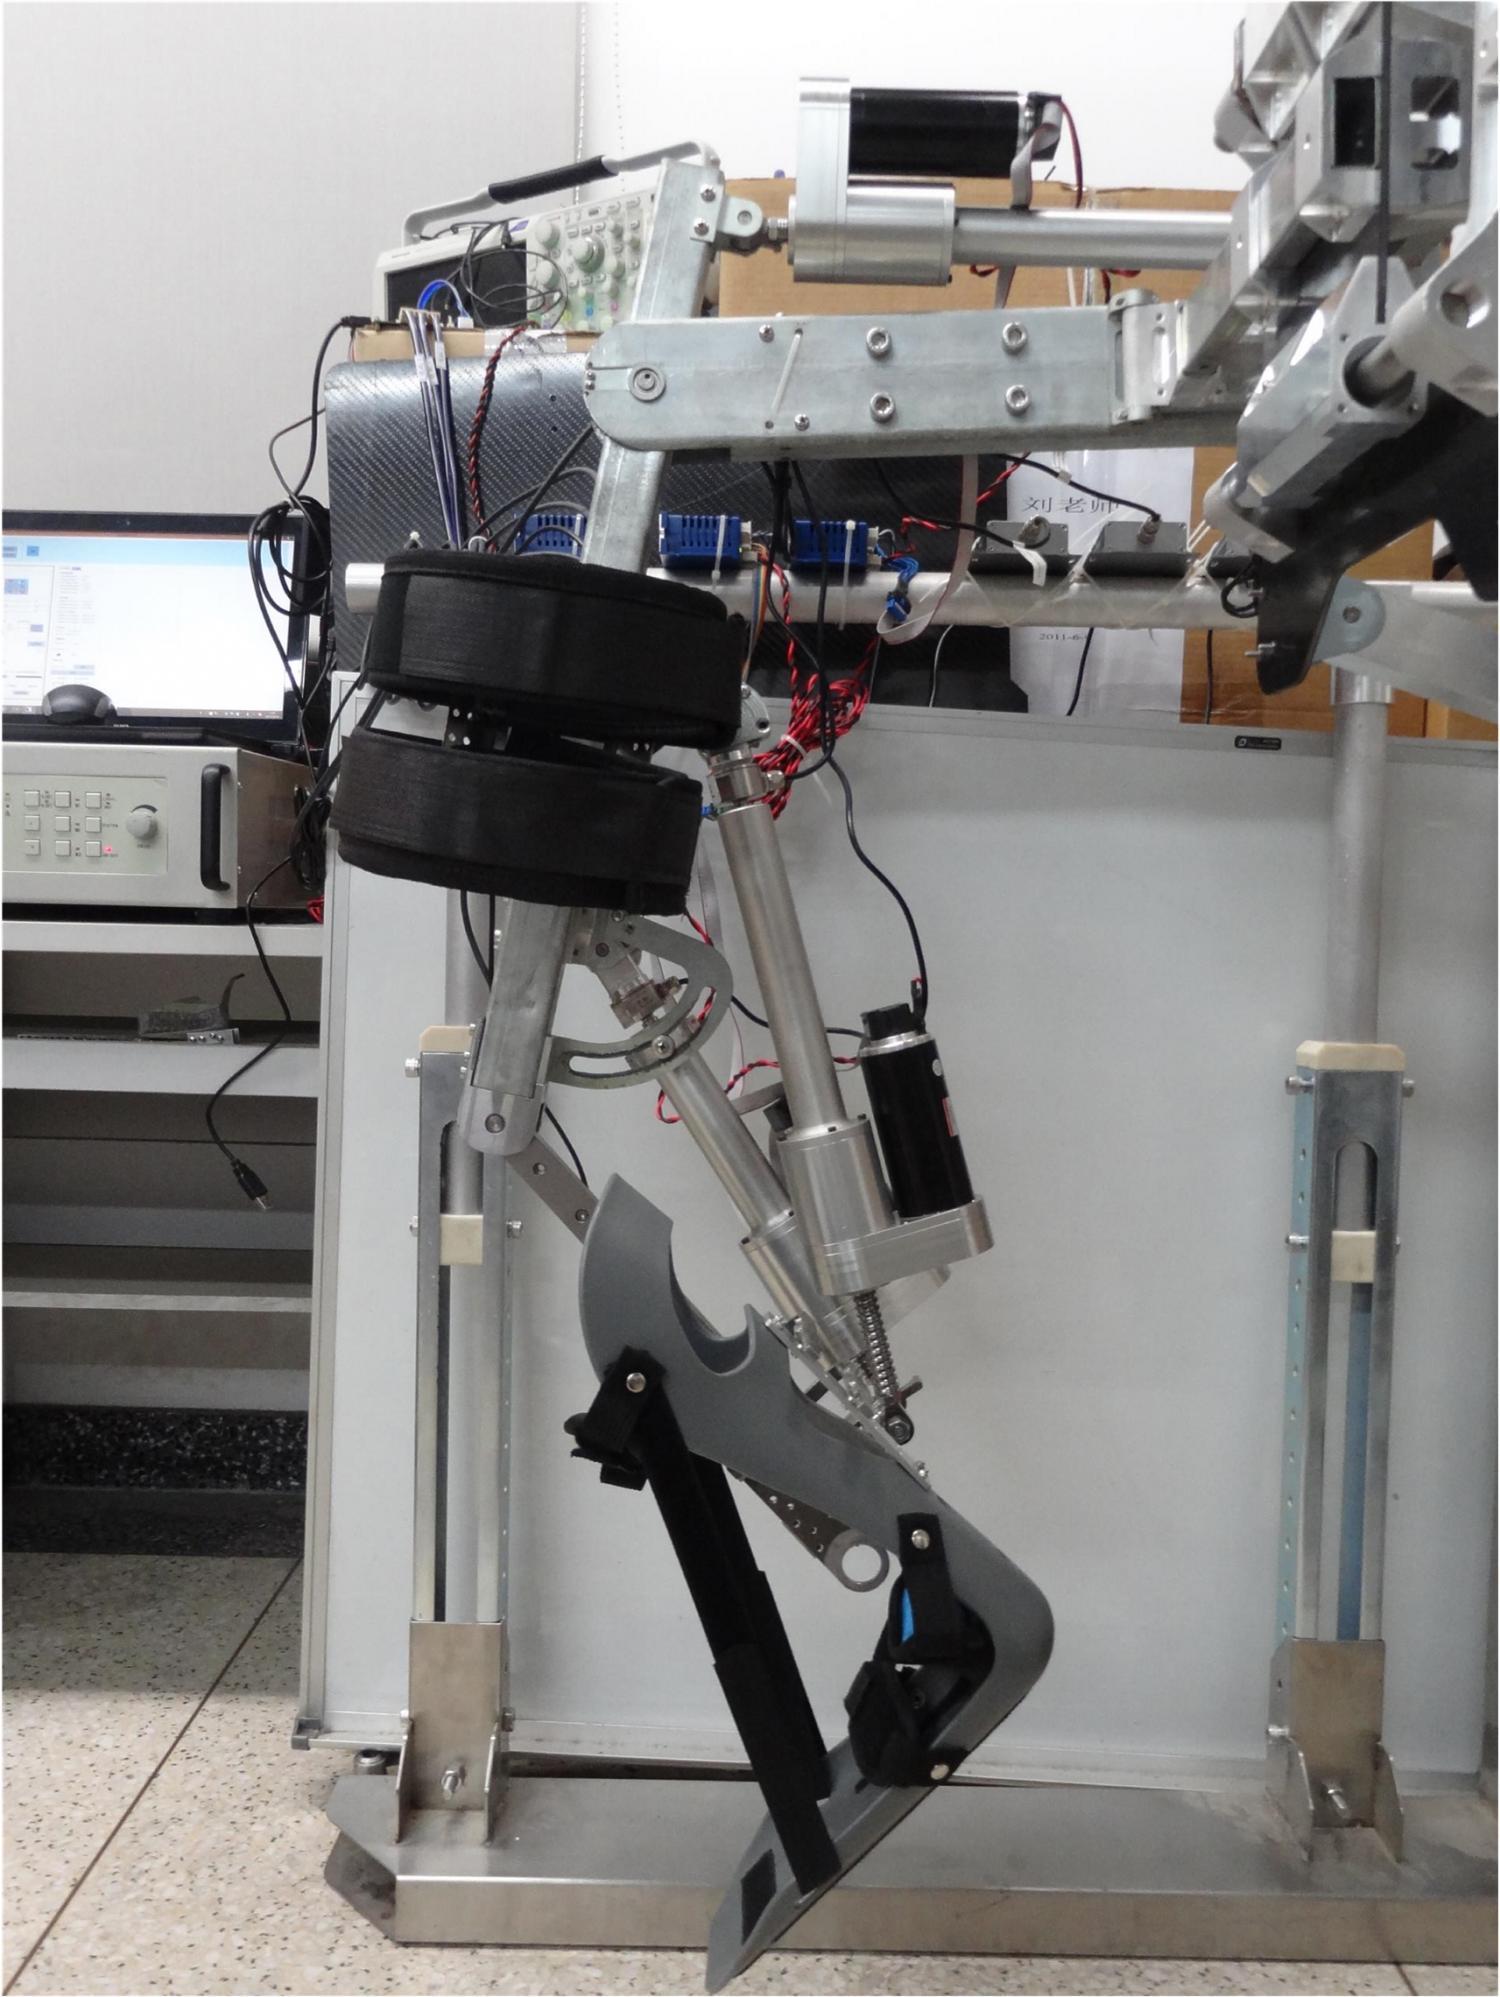 A prototype of the Beihang robot.